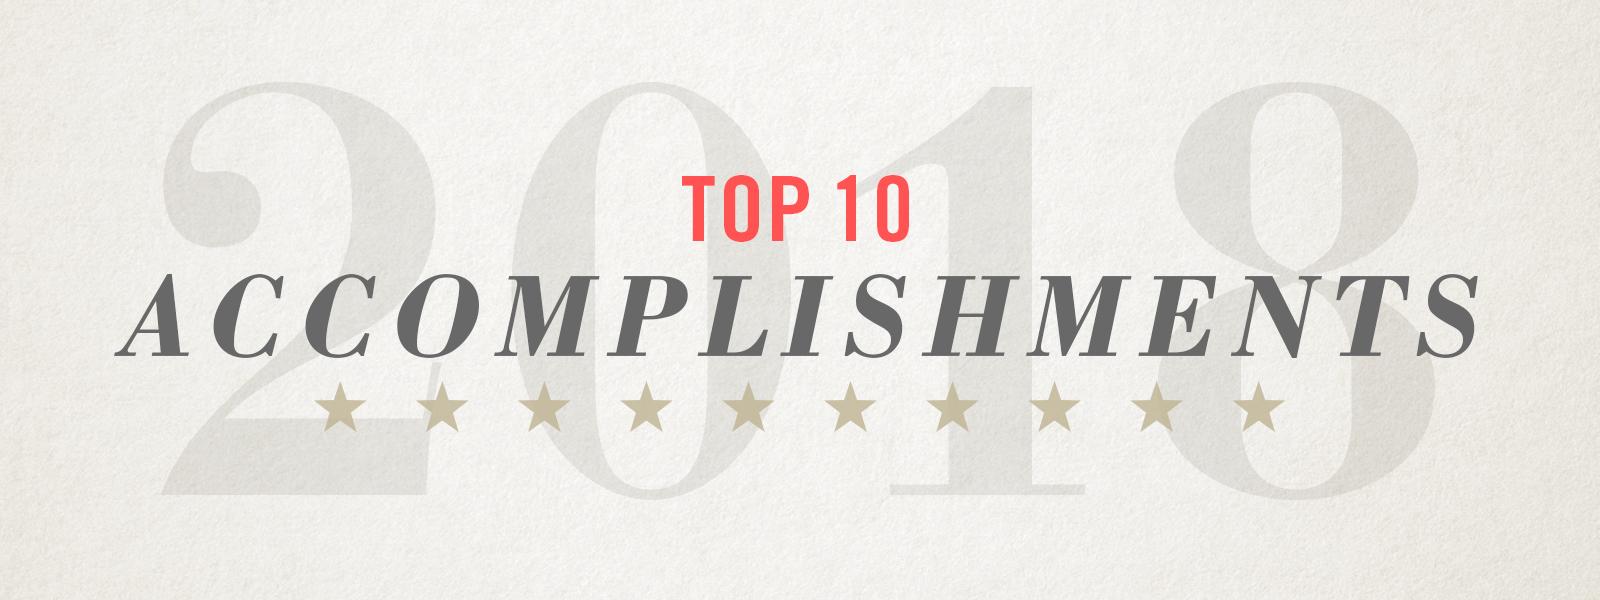 top 10 accomplishments